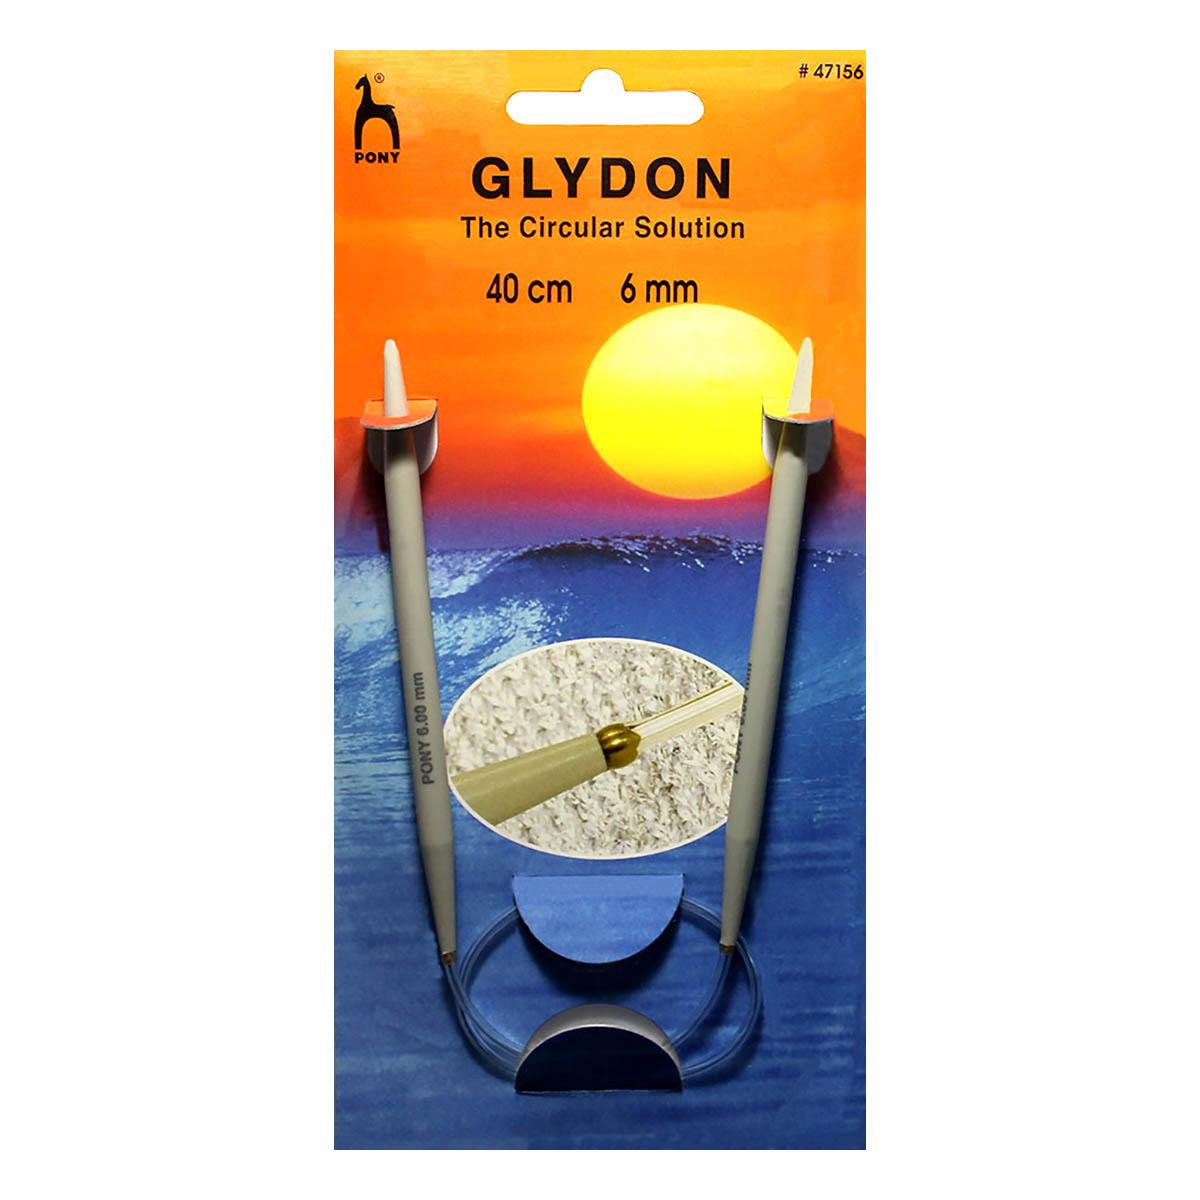 47156 Спицы GLYDON круговые 6,00 мм/ 40 см, пластик PONY